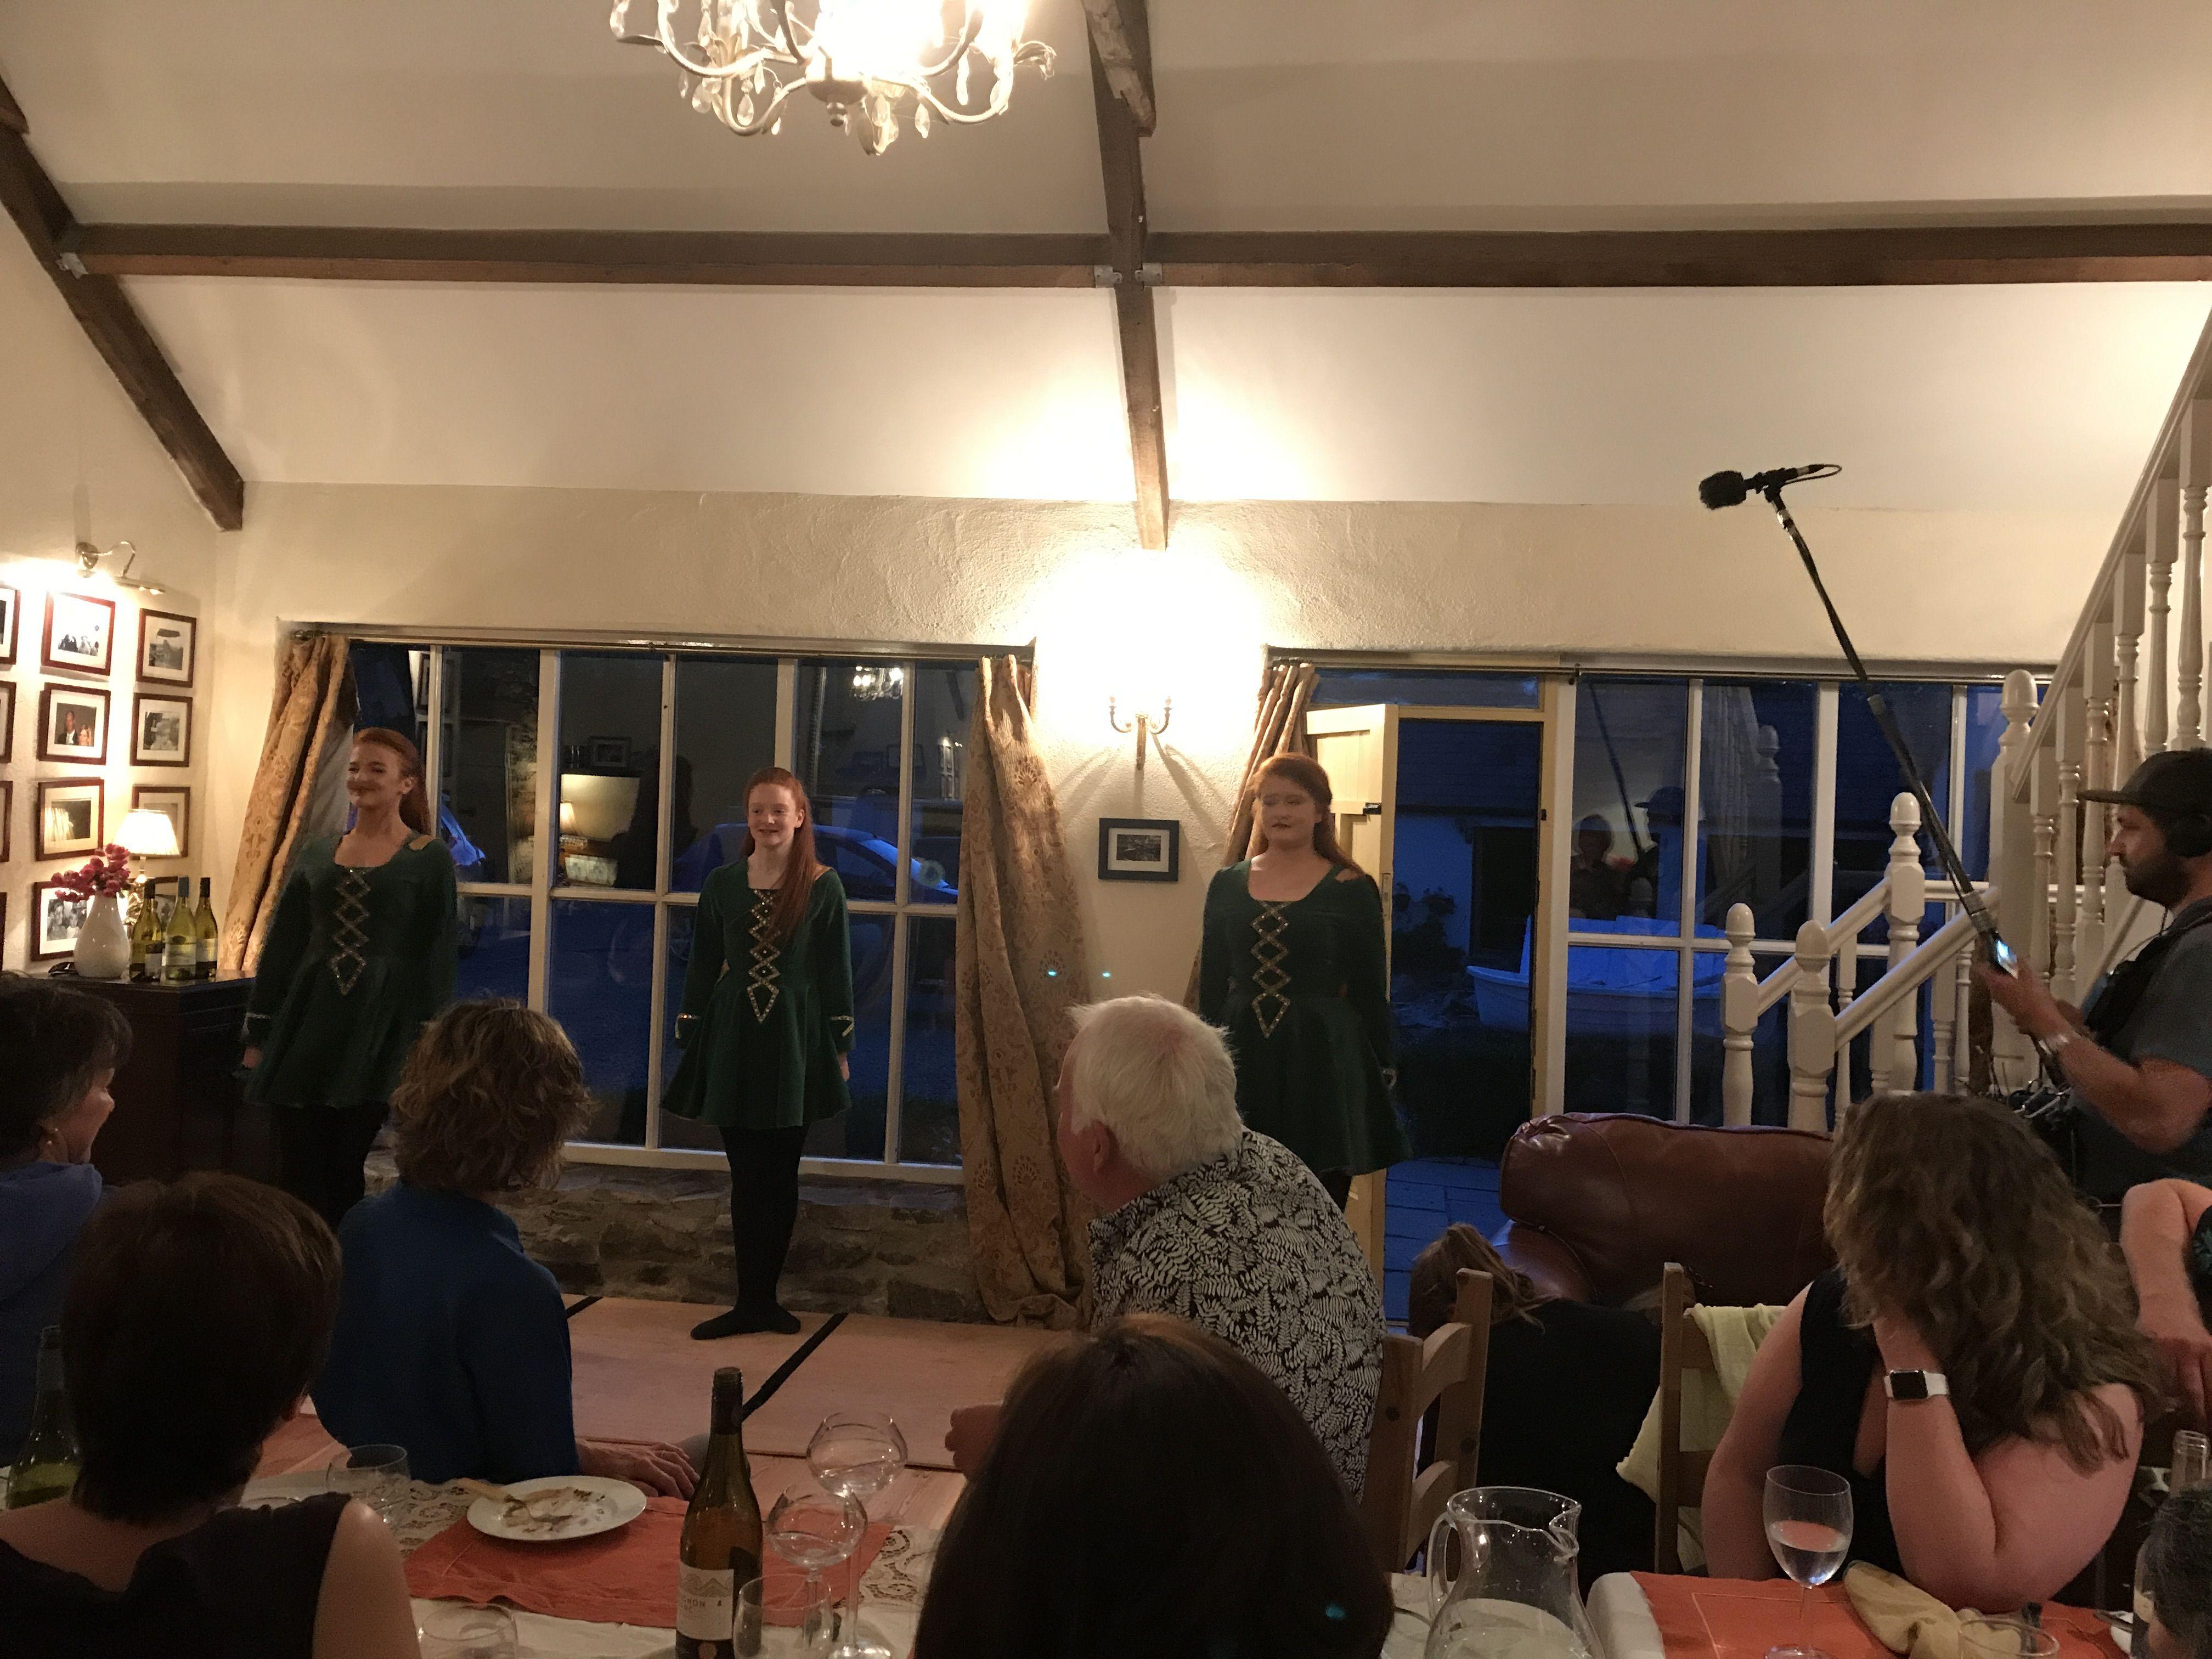 Enjoying Irish dancing after dinner